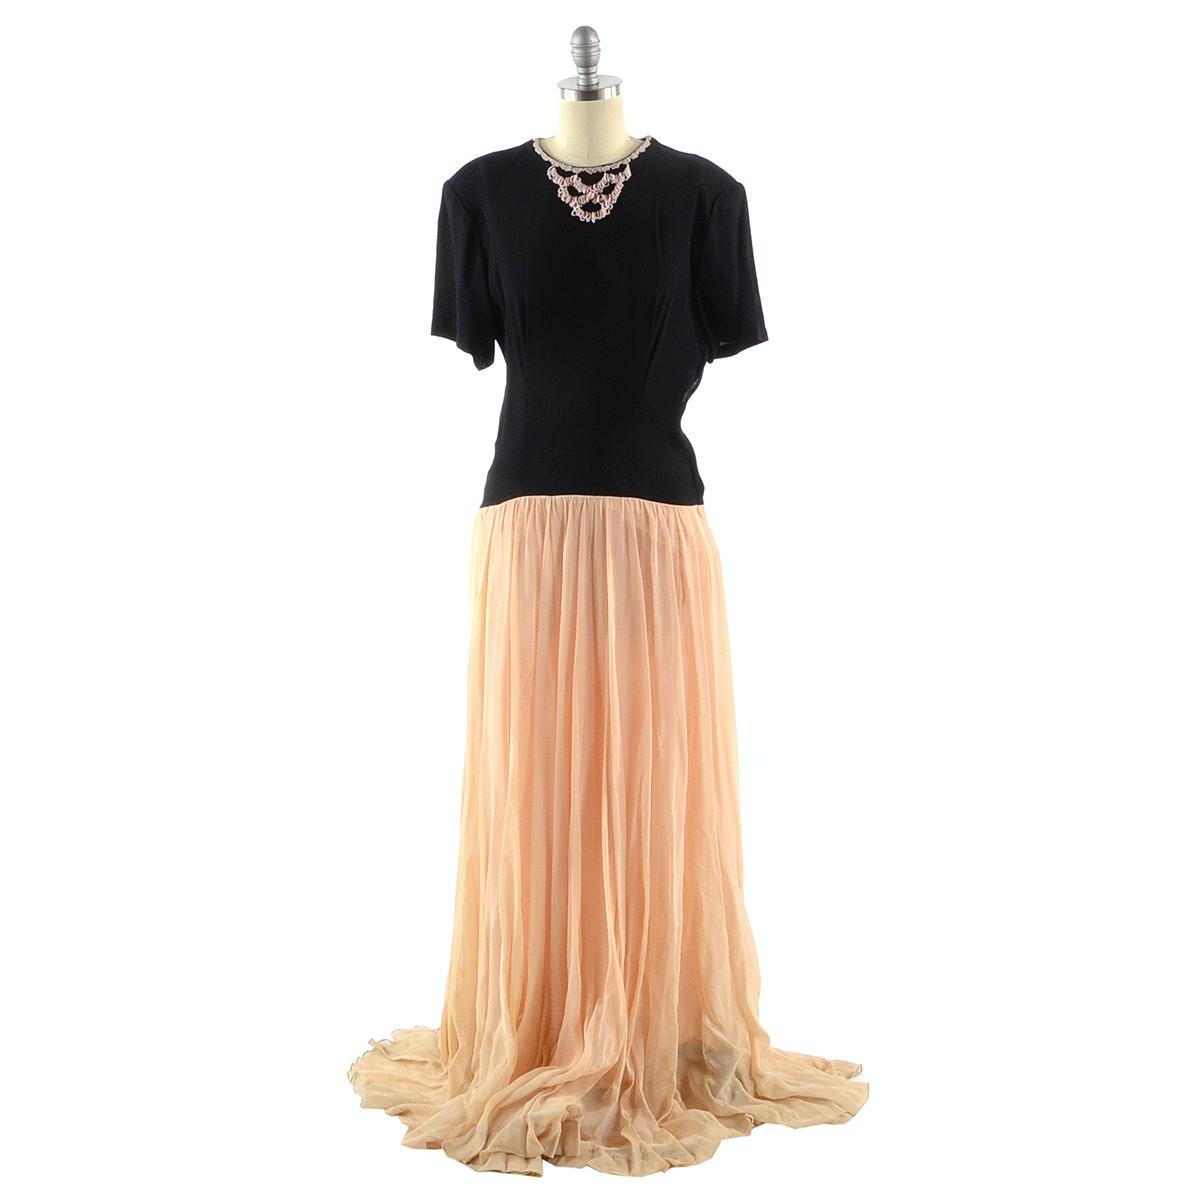 Vintage Crepe and Chiffon Evening Dress